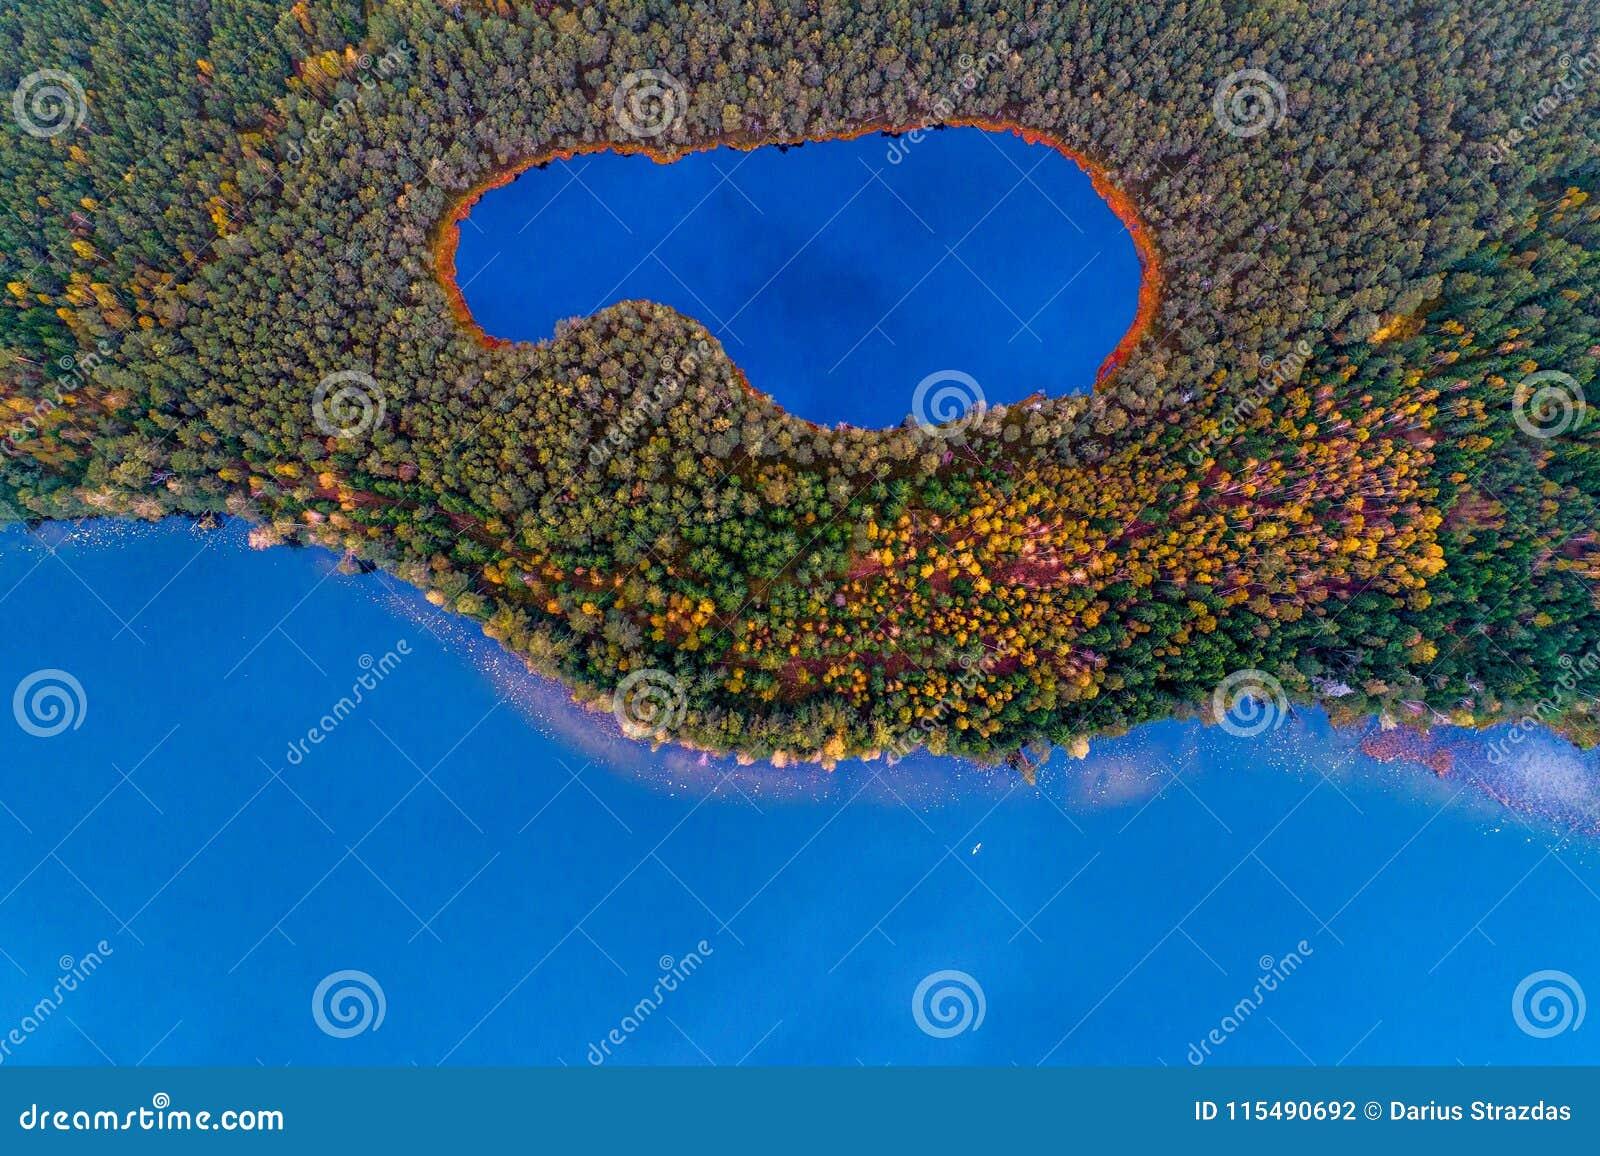 Lucht hoogste mening van twee meren in bos